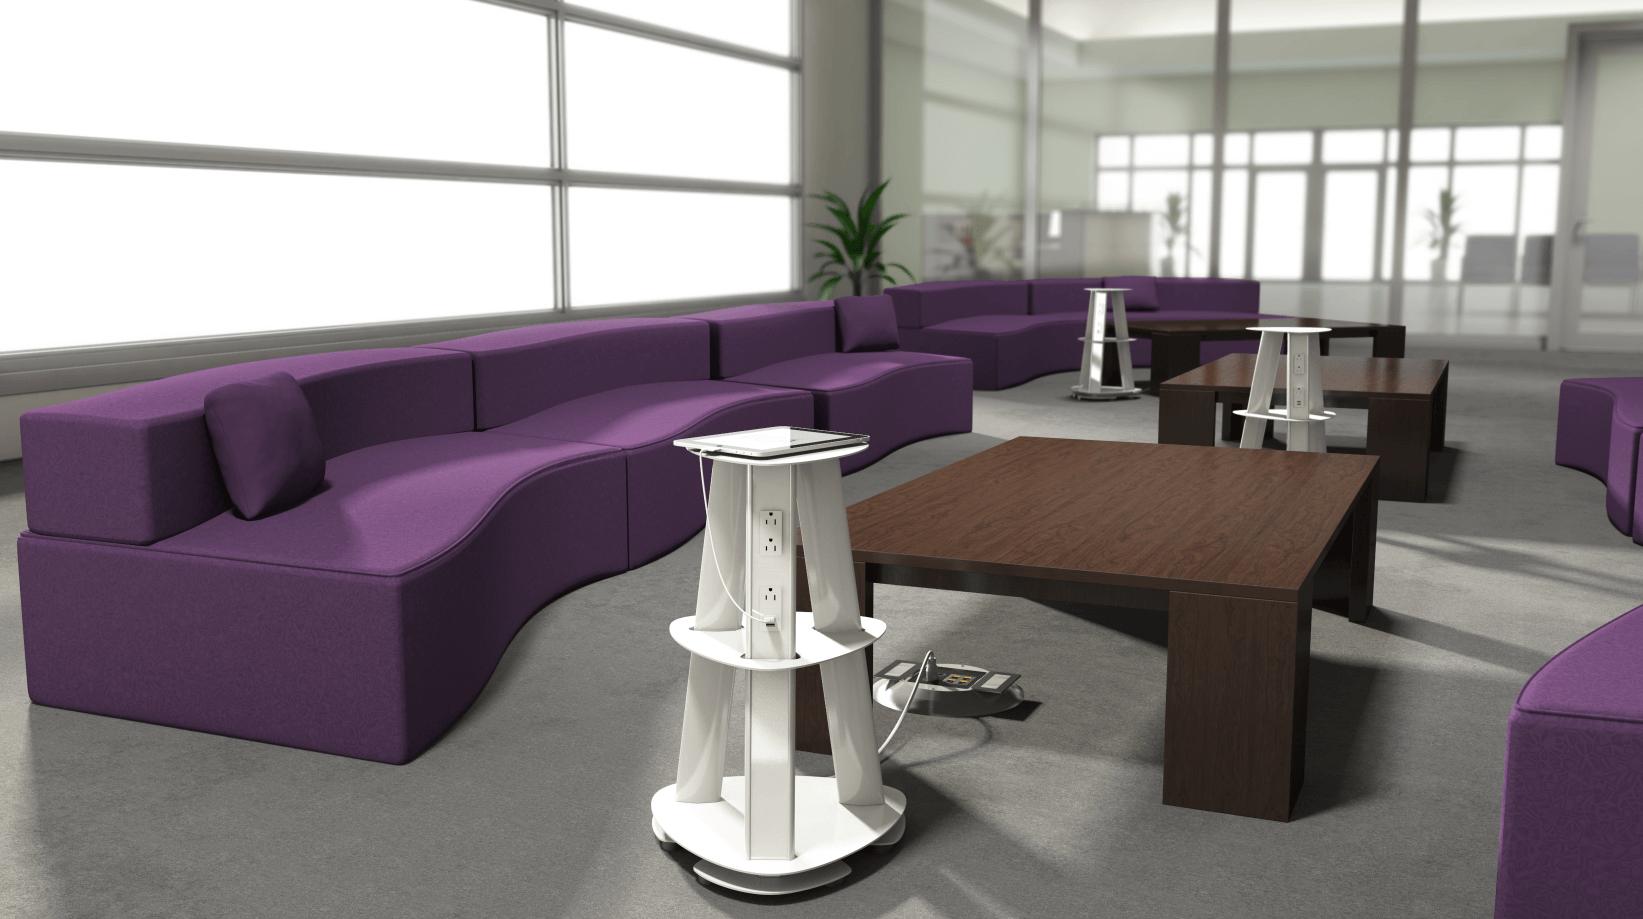 Usb Charging Hub >> ECA Isle Free Standing Portable Power Tower Charging Station, 9 AC & 6 USB - Conference Room AV